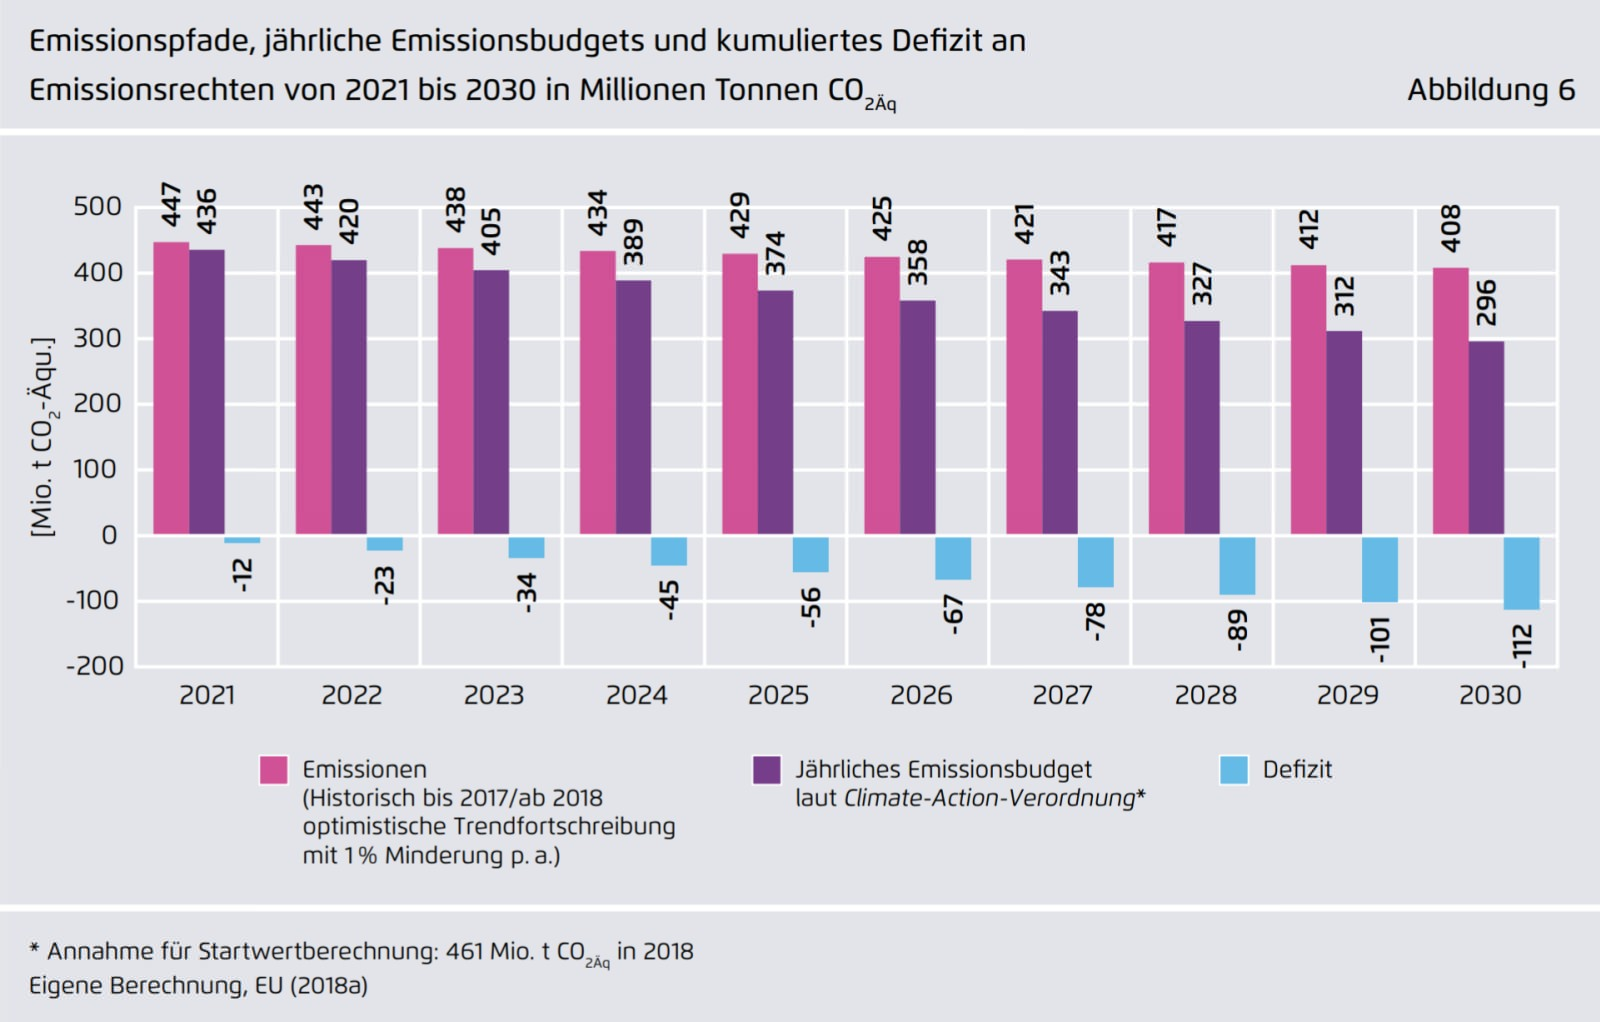 Defizite Emissionsbudget Non-ETS 2030